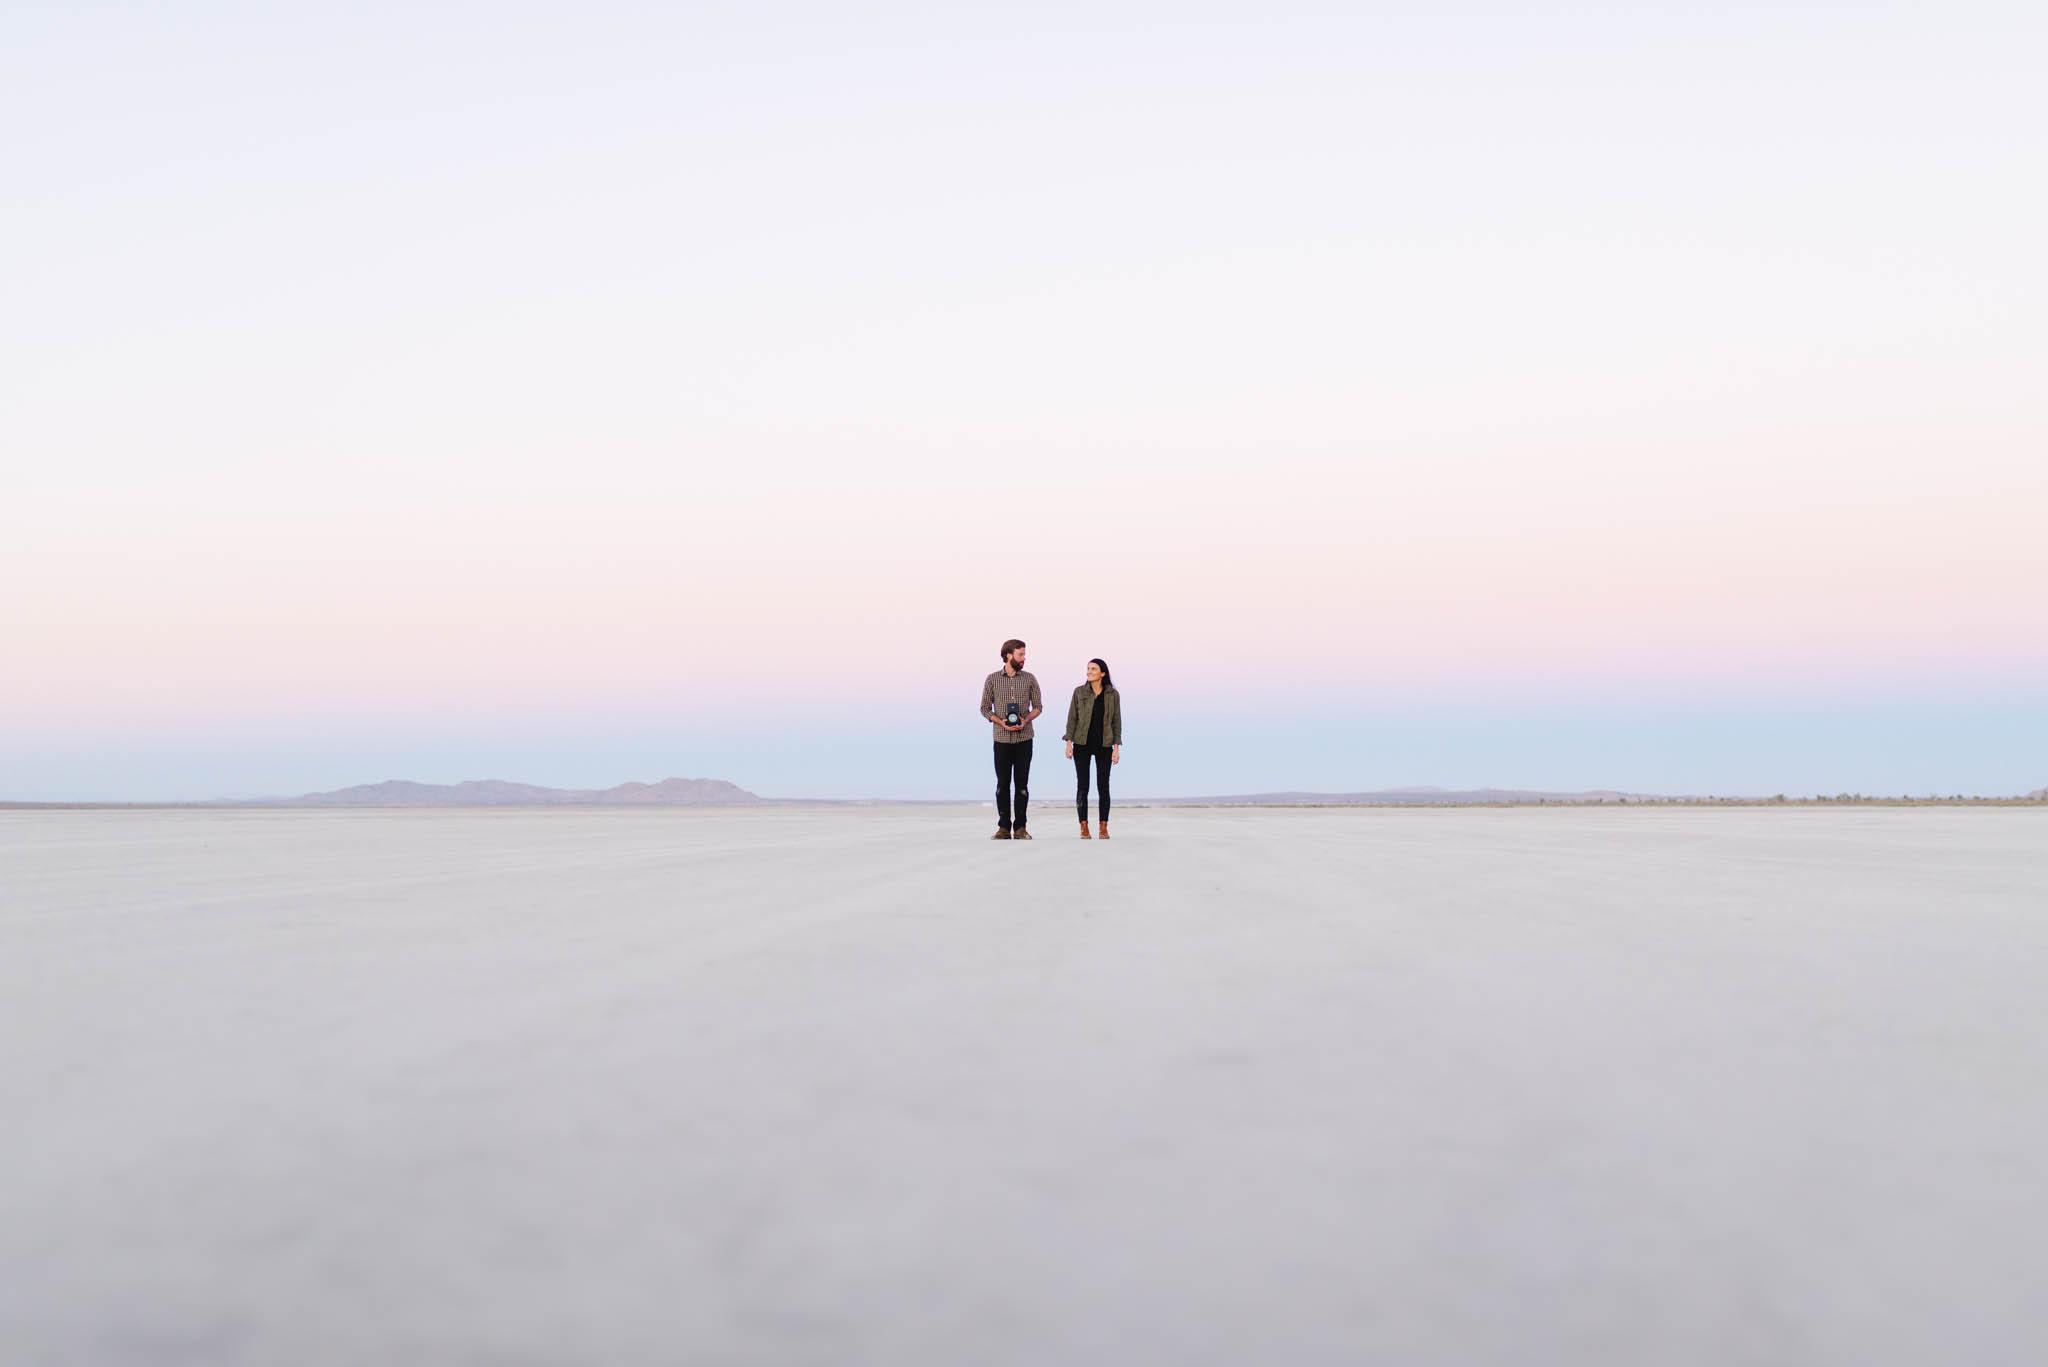 ©The Ryans Photography - Sunrise Salt Flats, Southern California-3.jpg